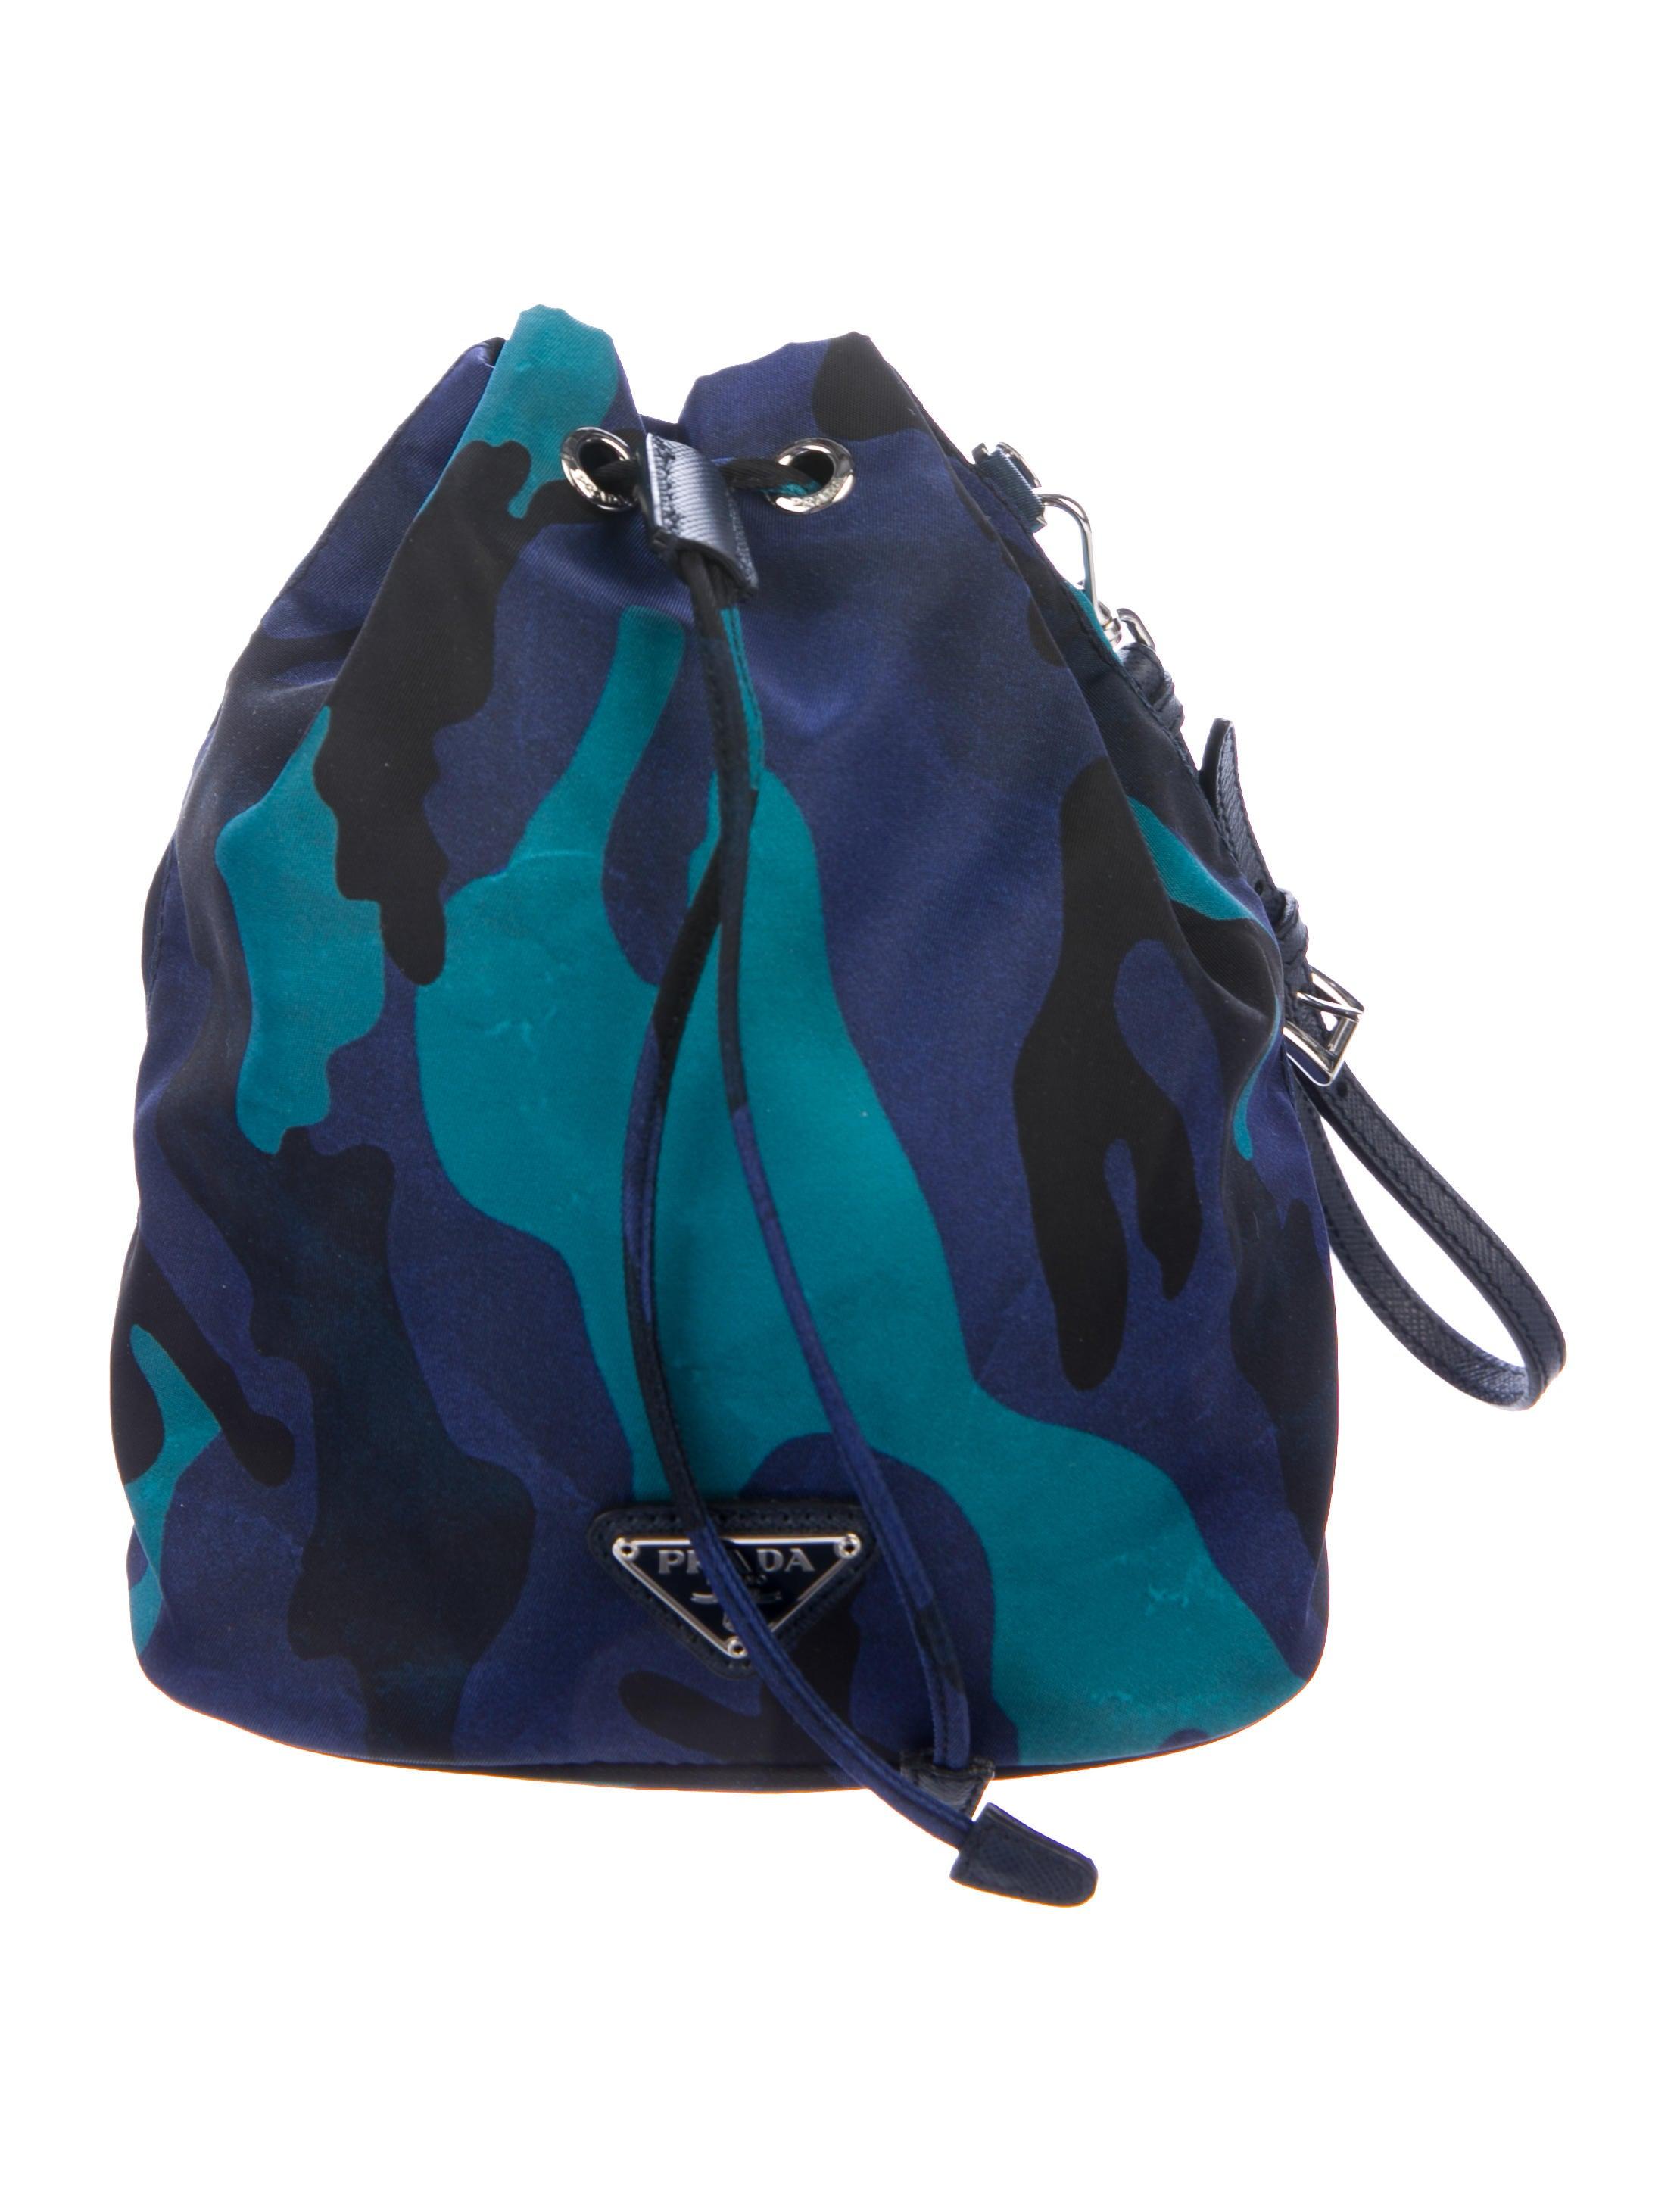 b353915229c4e2 Prada Camouflage Print Necessaire Drawstring Pouch - Handbags ...